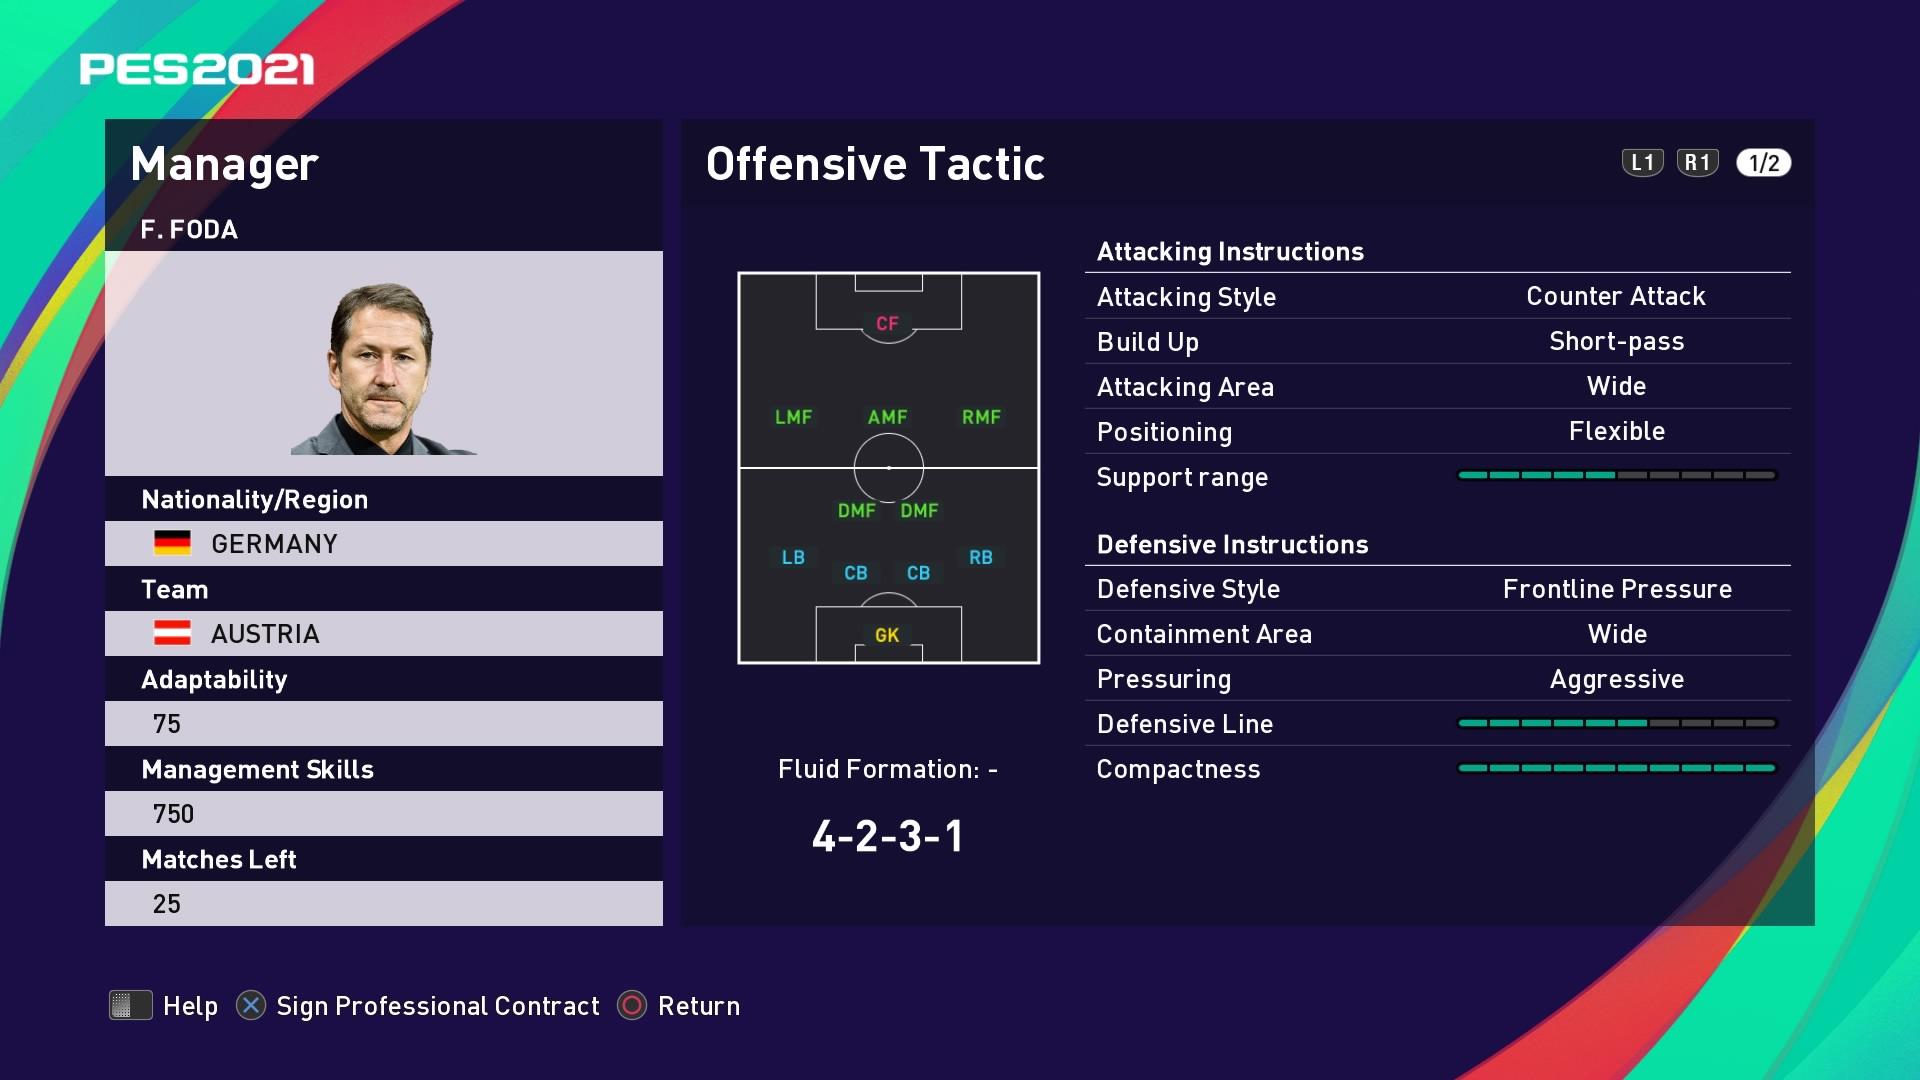 F. Foda (Franco Foda) Offensive Tactic in PES 2021 myClub